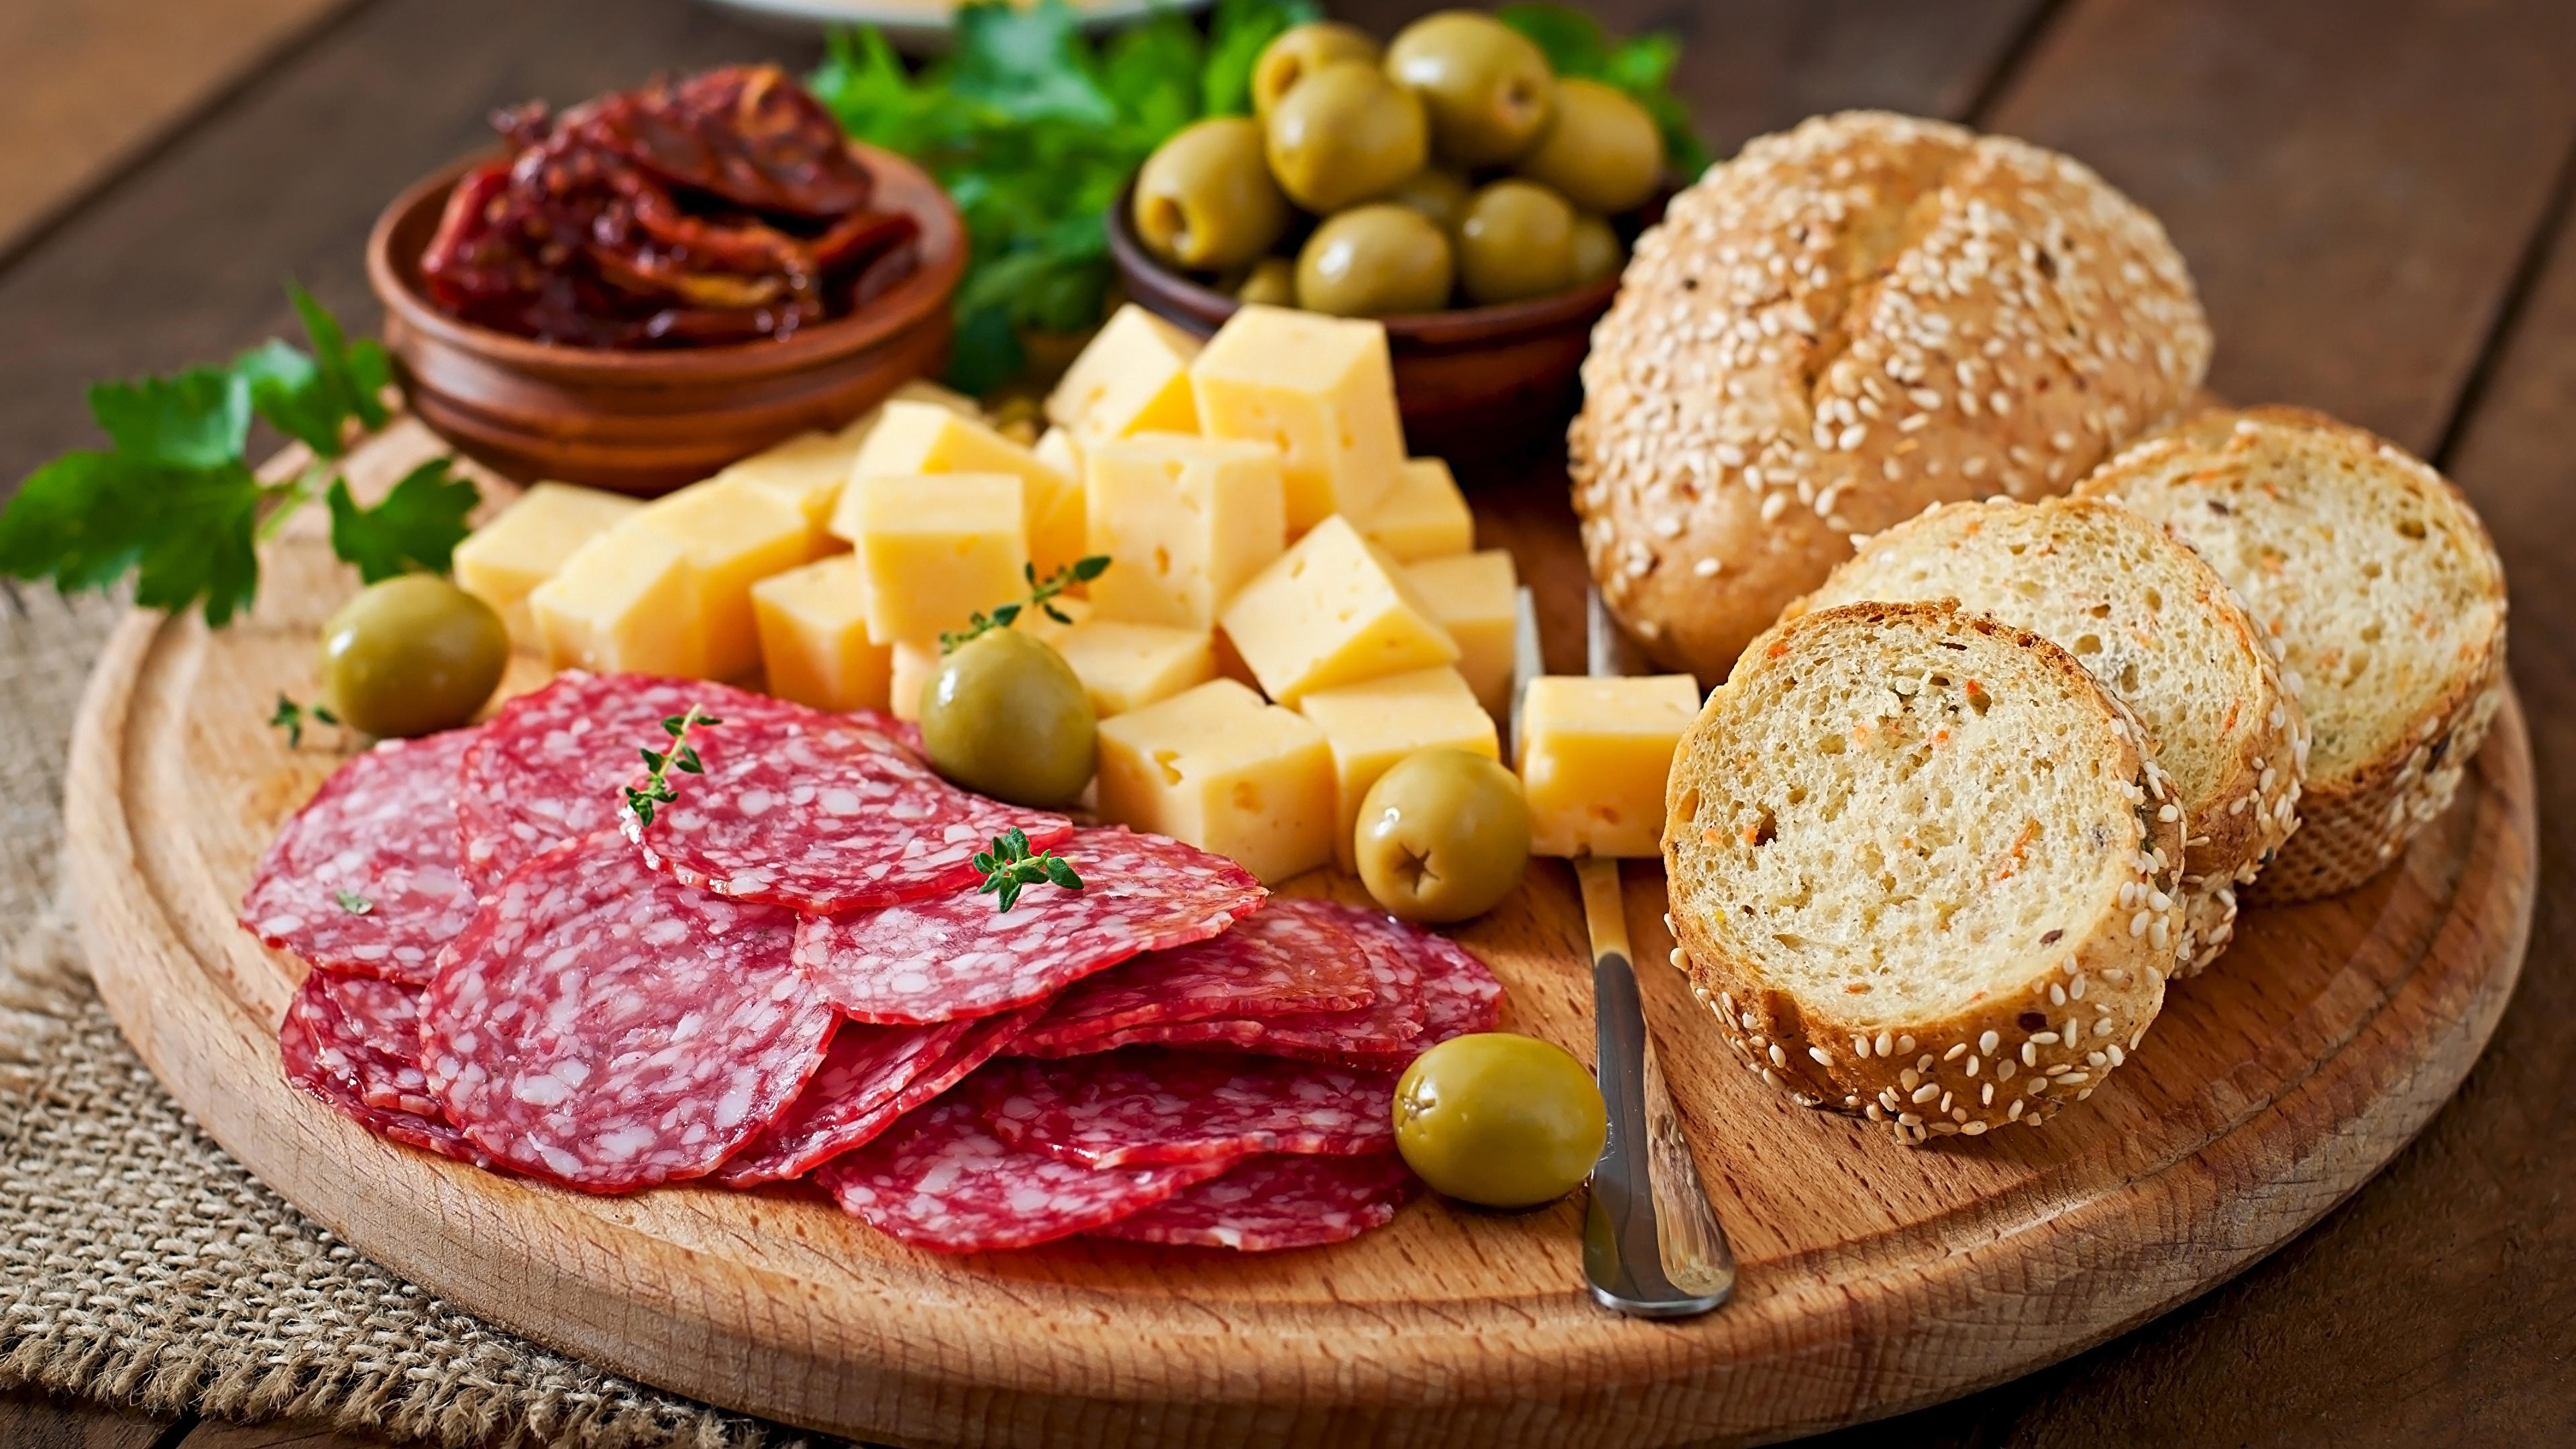 мясо, колбаса, оливки, сыр без смс